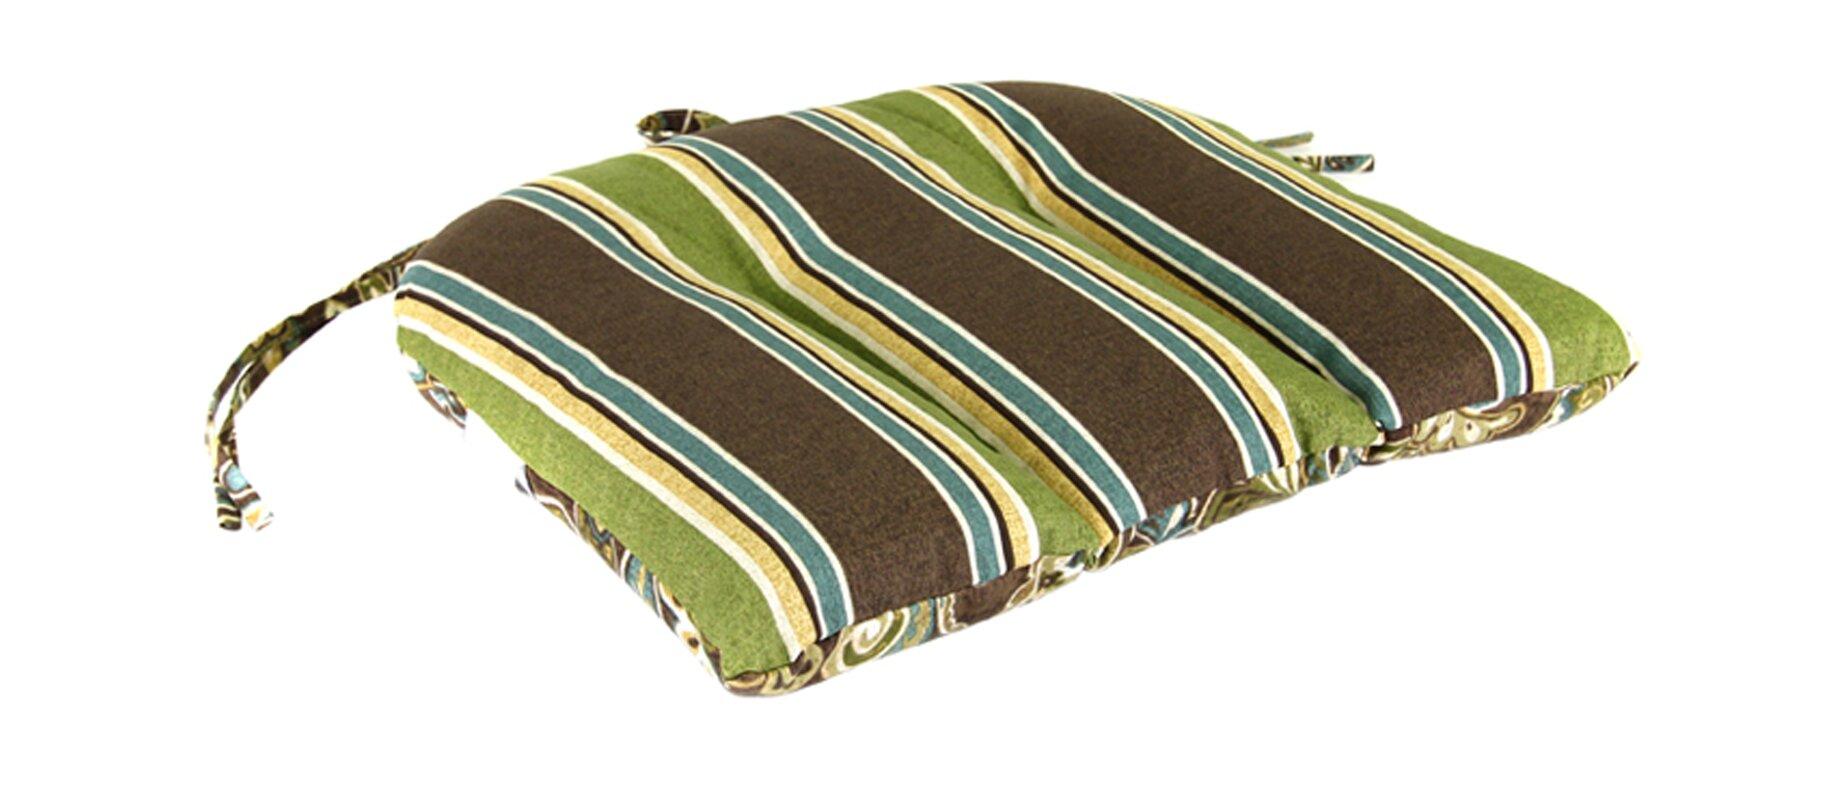 ... Dining Chair Patio Furniture Cushions; SKU: JORD1480. Default_name